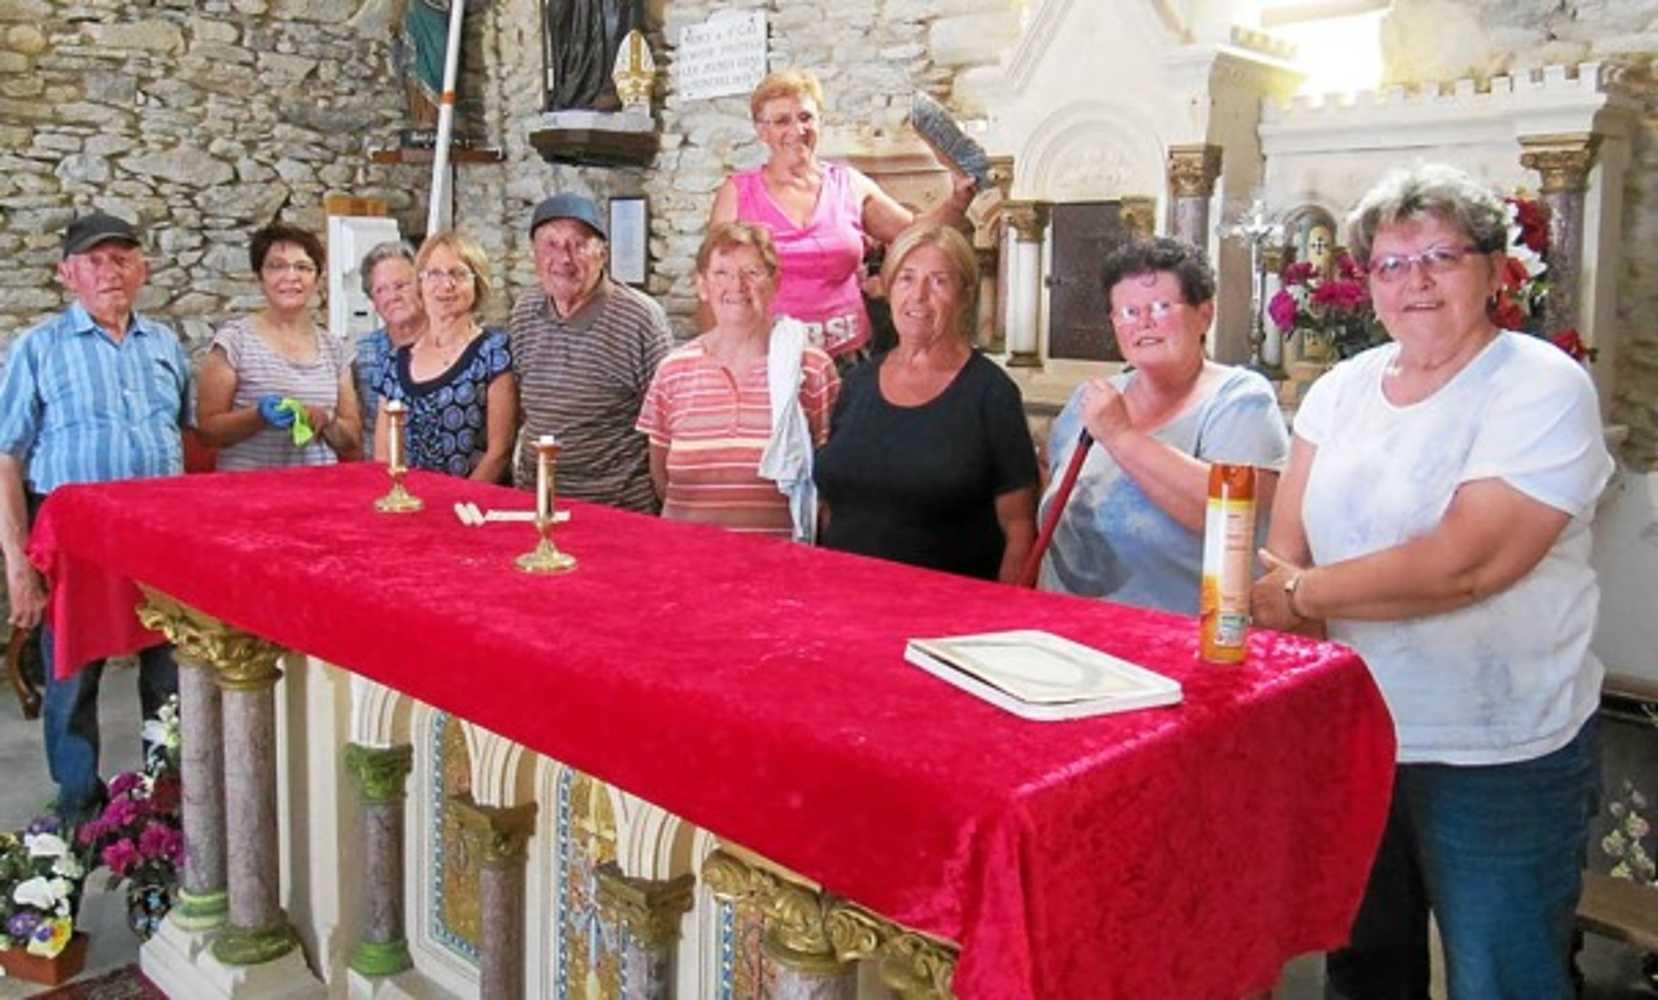 Comité Saint-Gal comitesaint-galbis